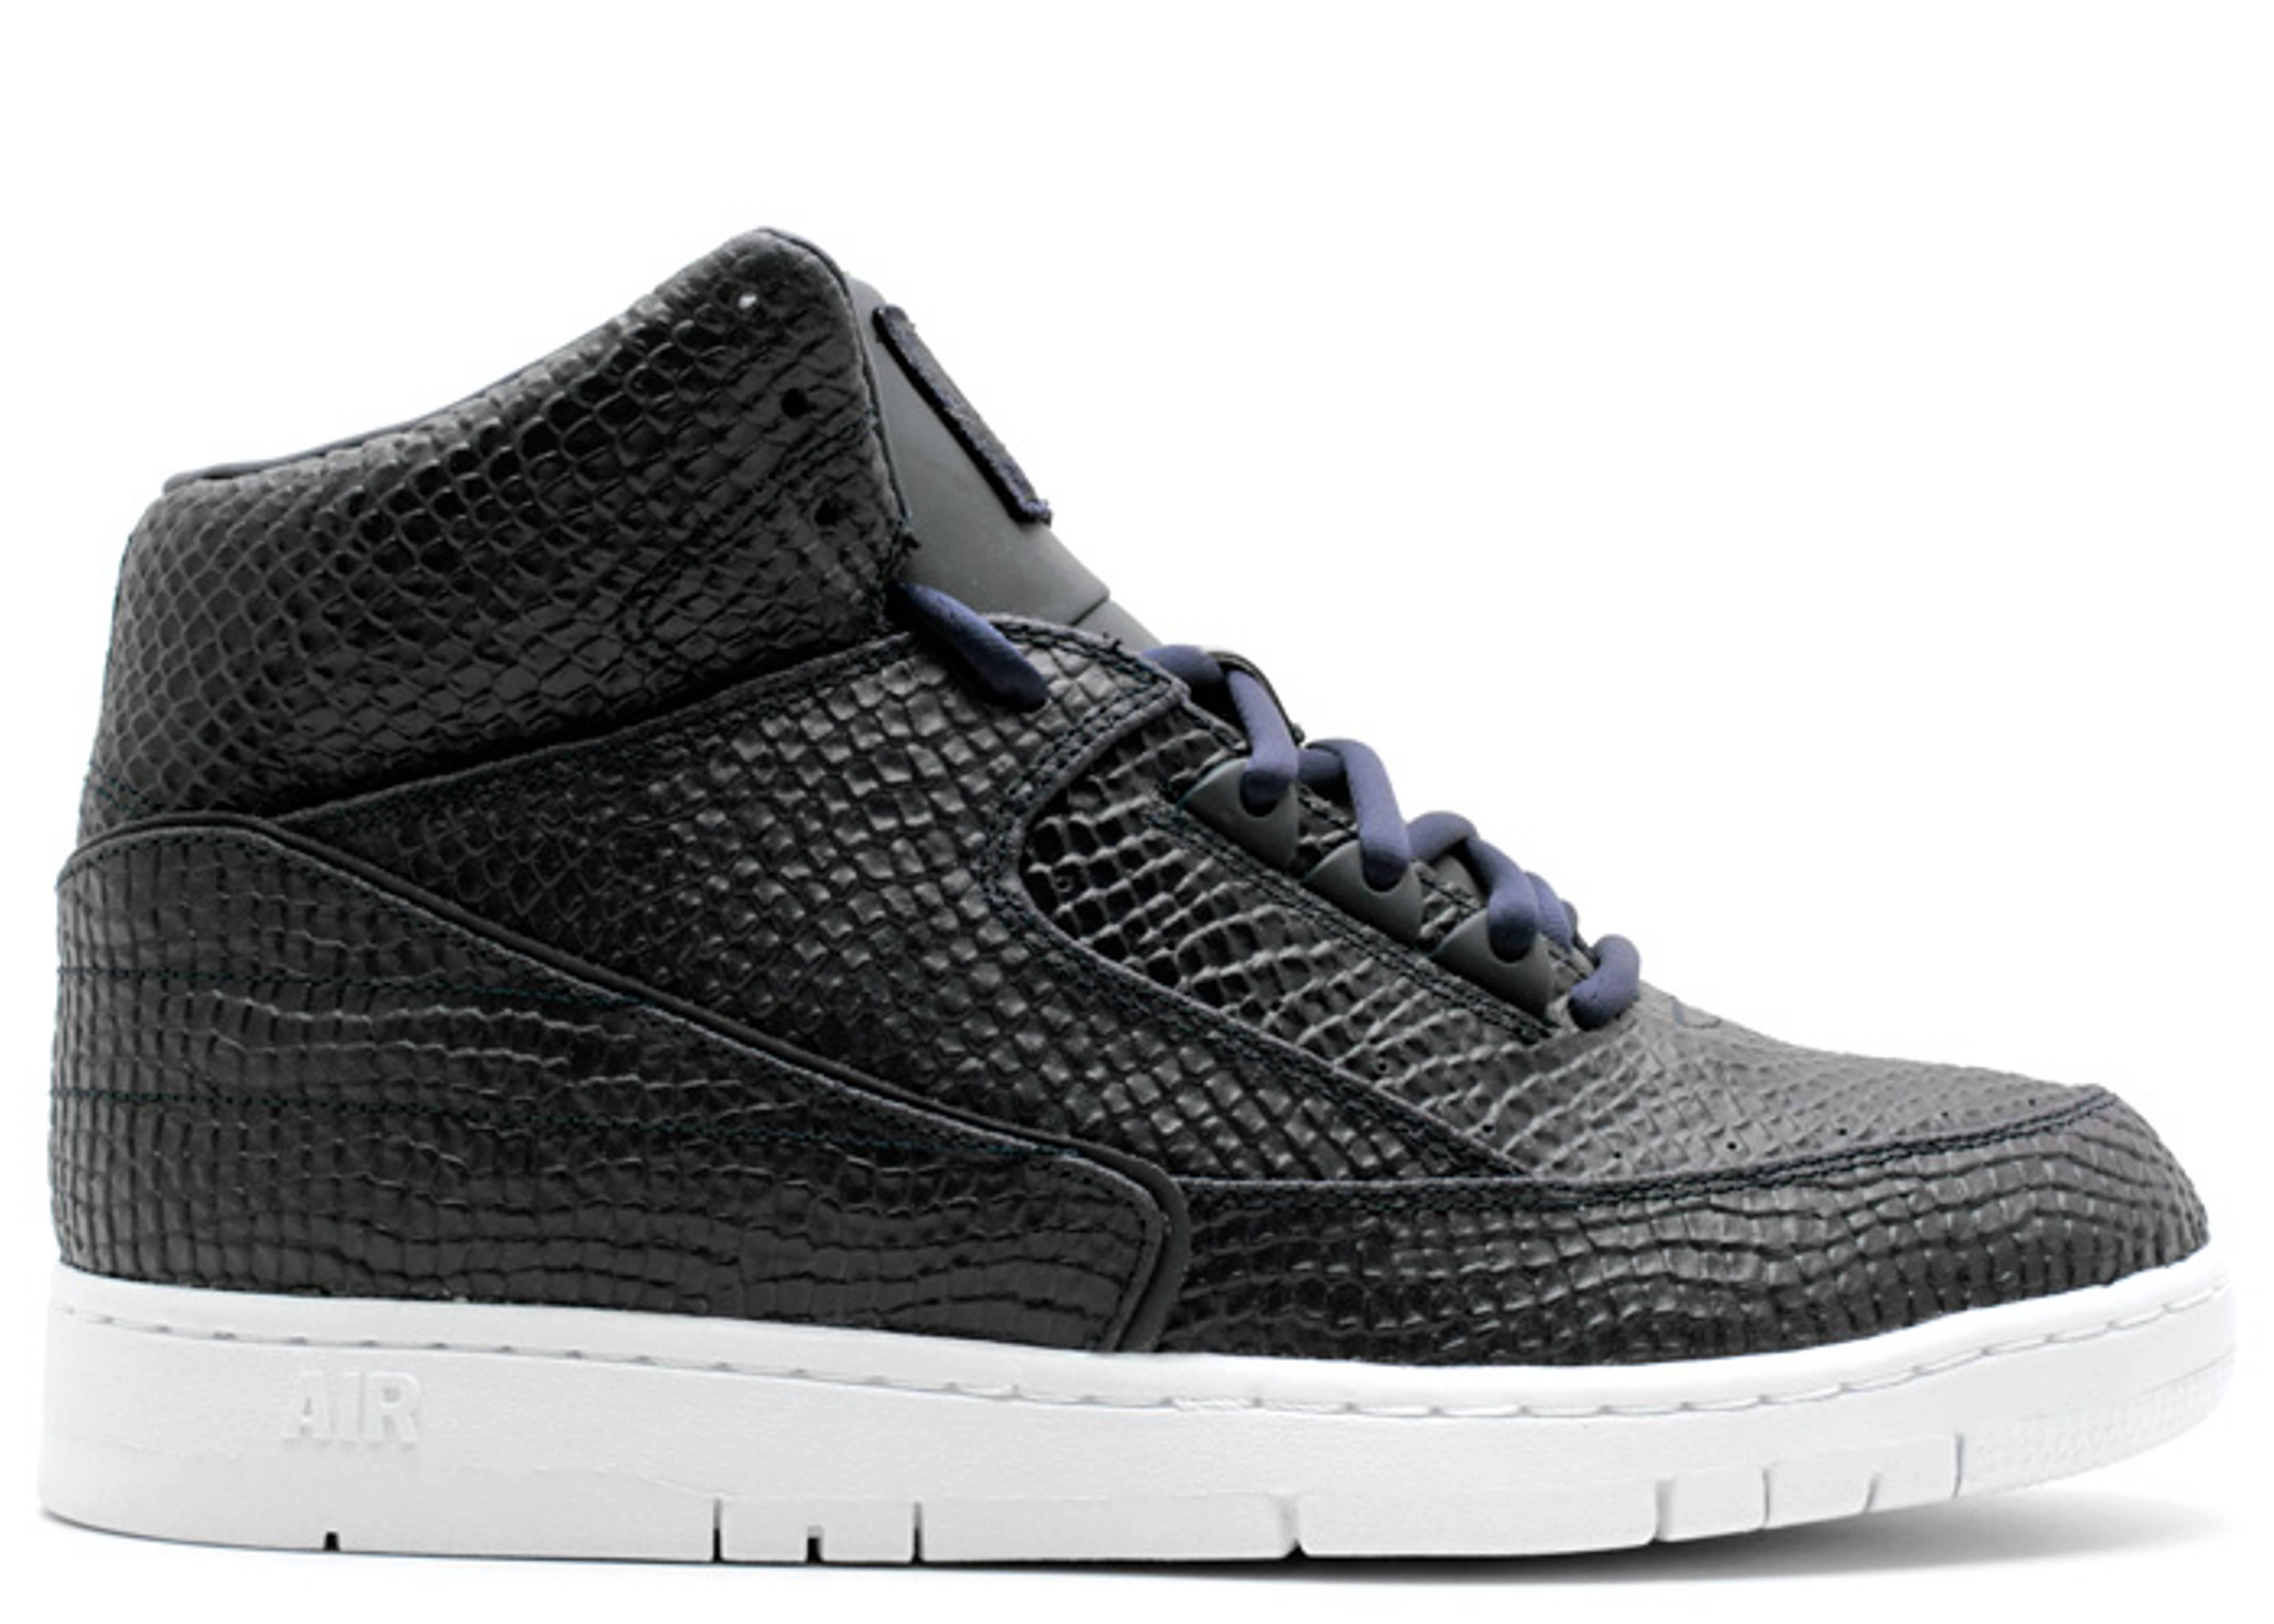 a69e05356015d4 Air Python Sp - Nike - 658394 400 - obsidian obsidian-white